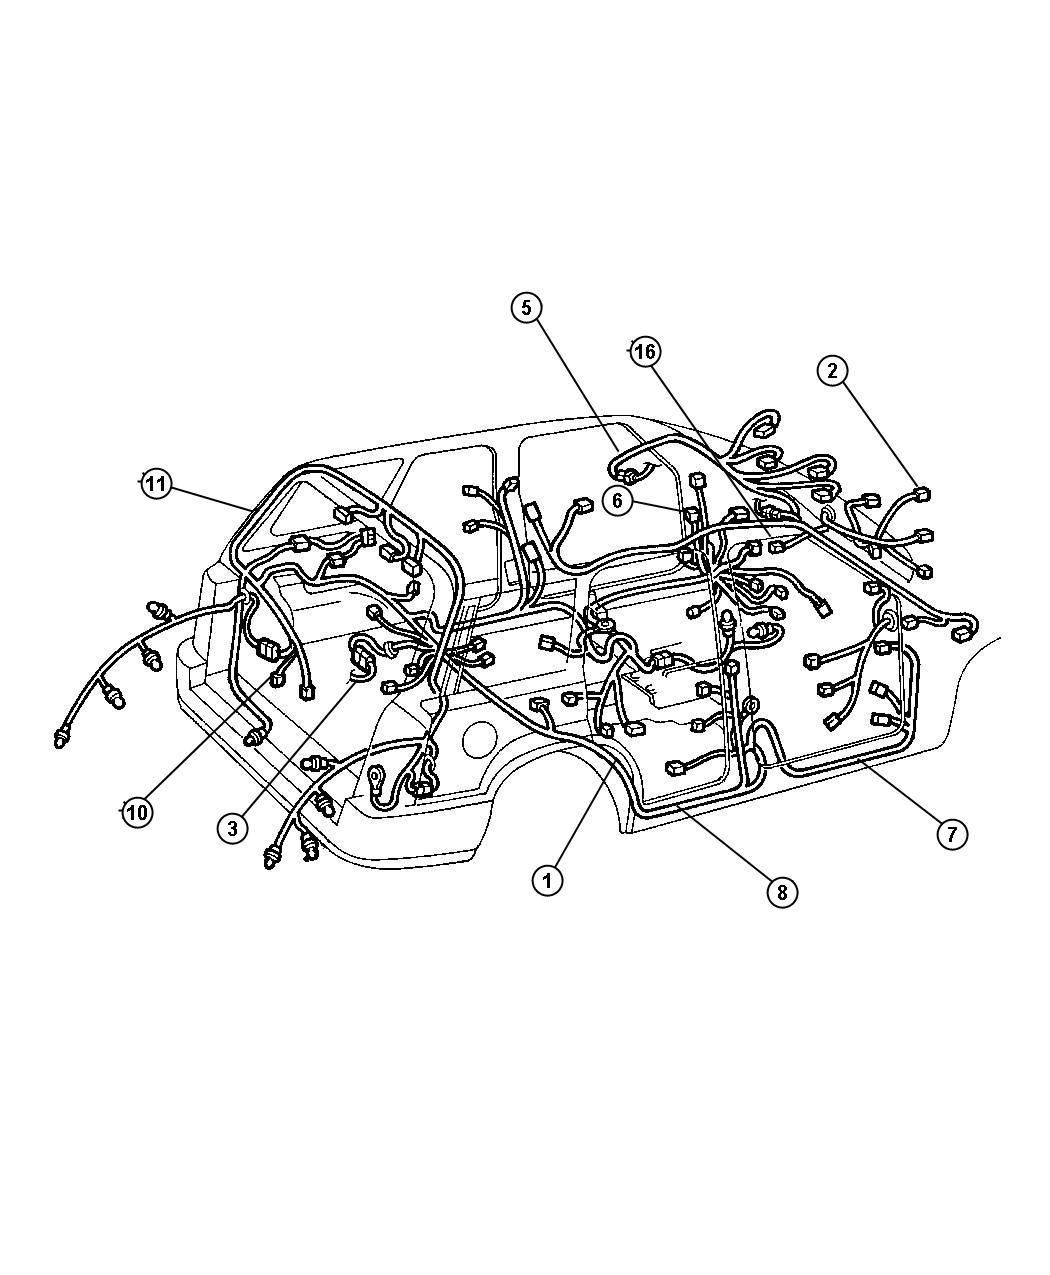 Jeep Liberty Adapter, converts 7-way round to 4-way flat